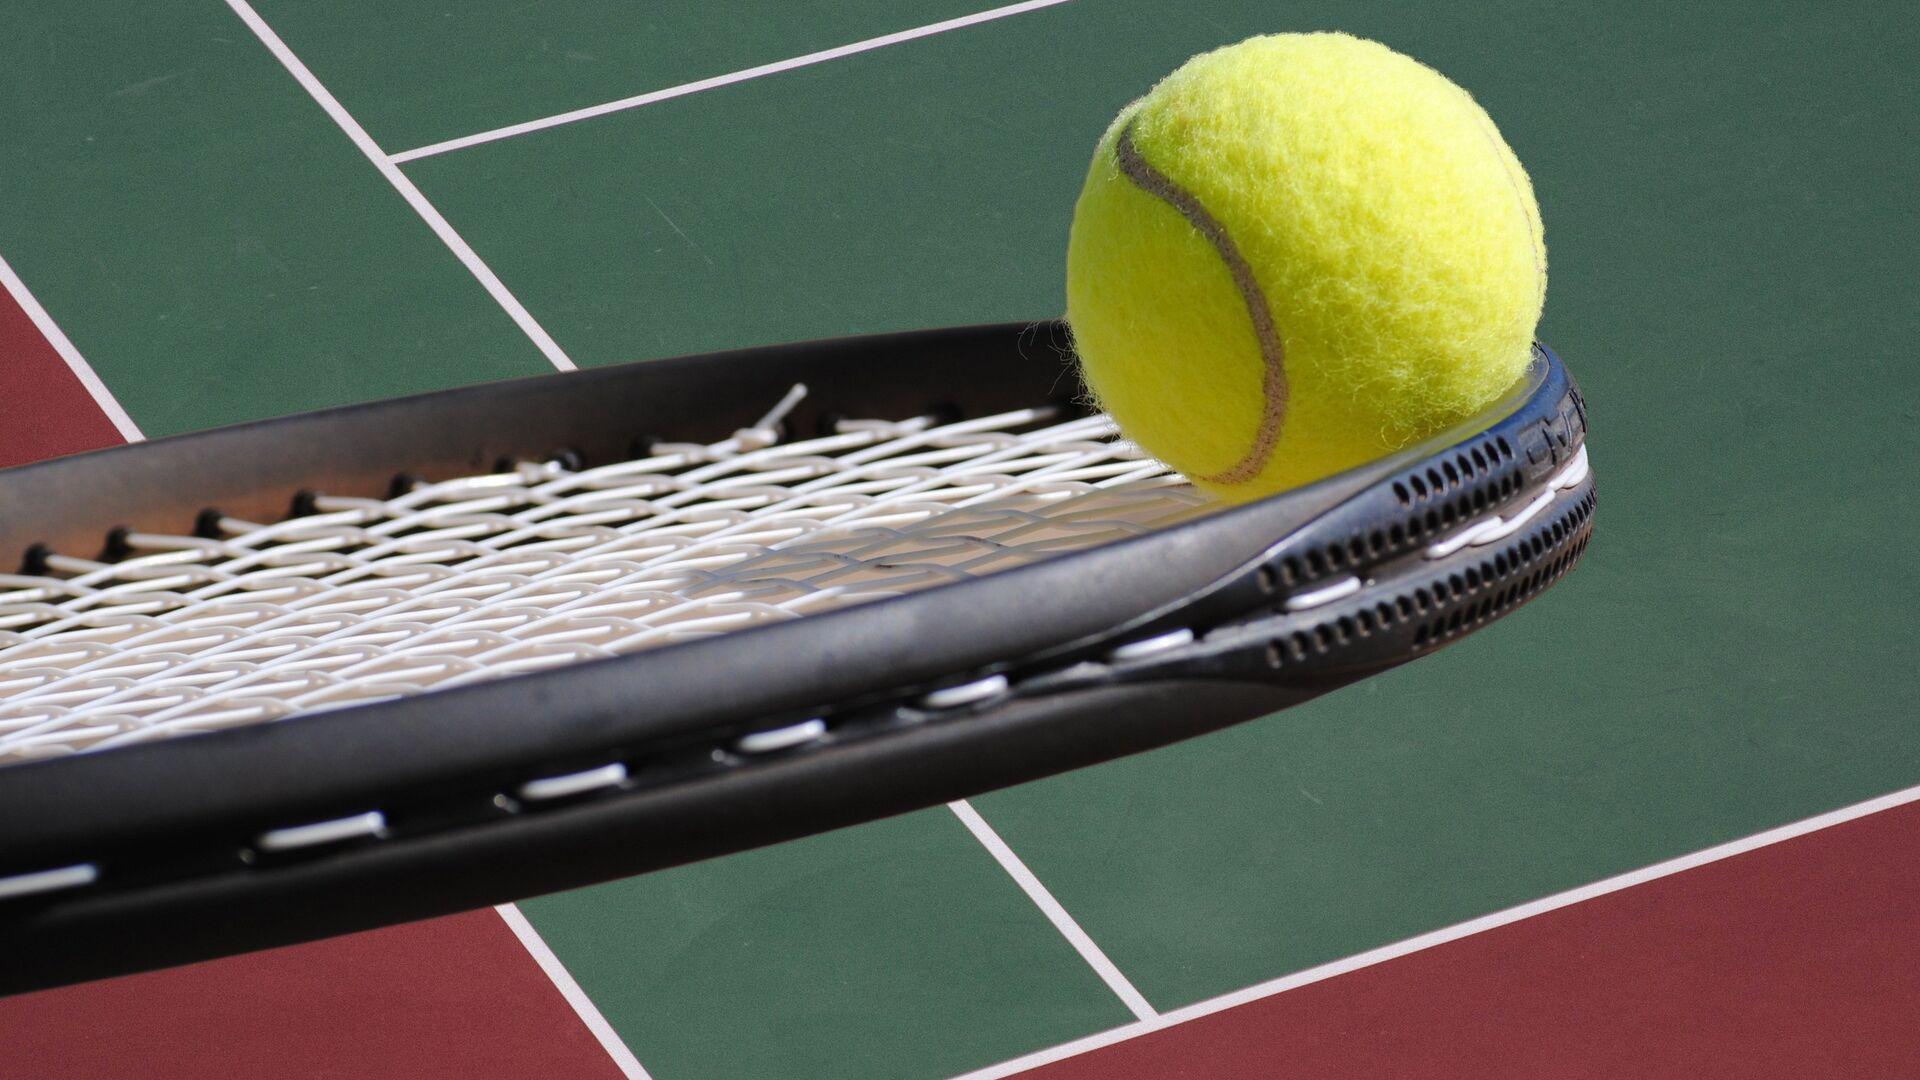 Pelota de tenis - Sputnik Mundo, 1920, 02.07.2021